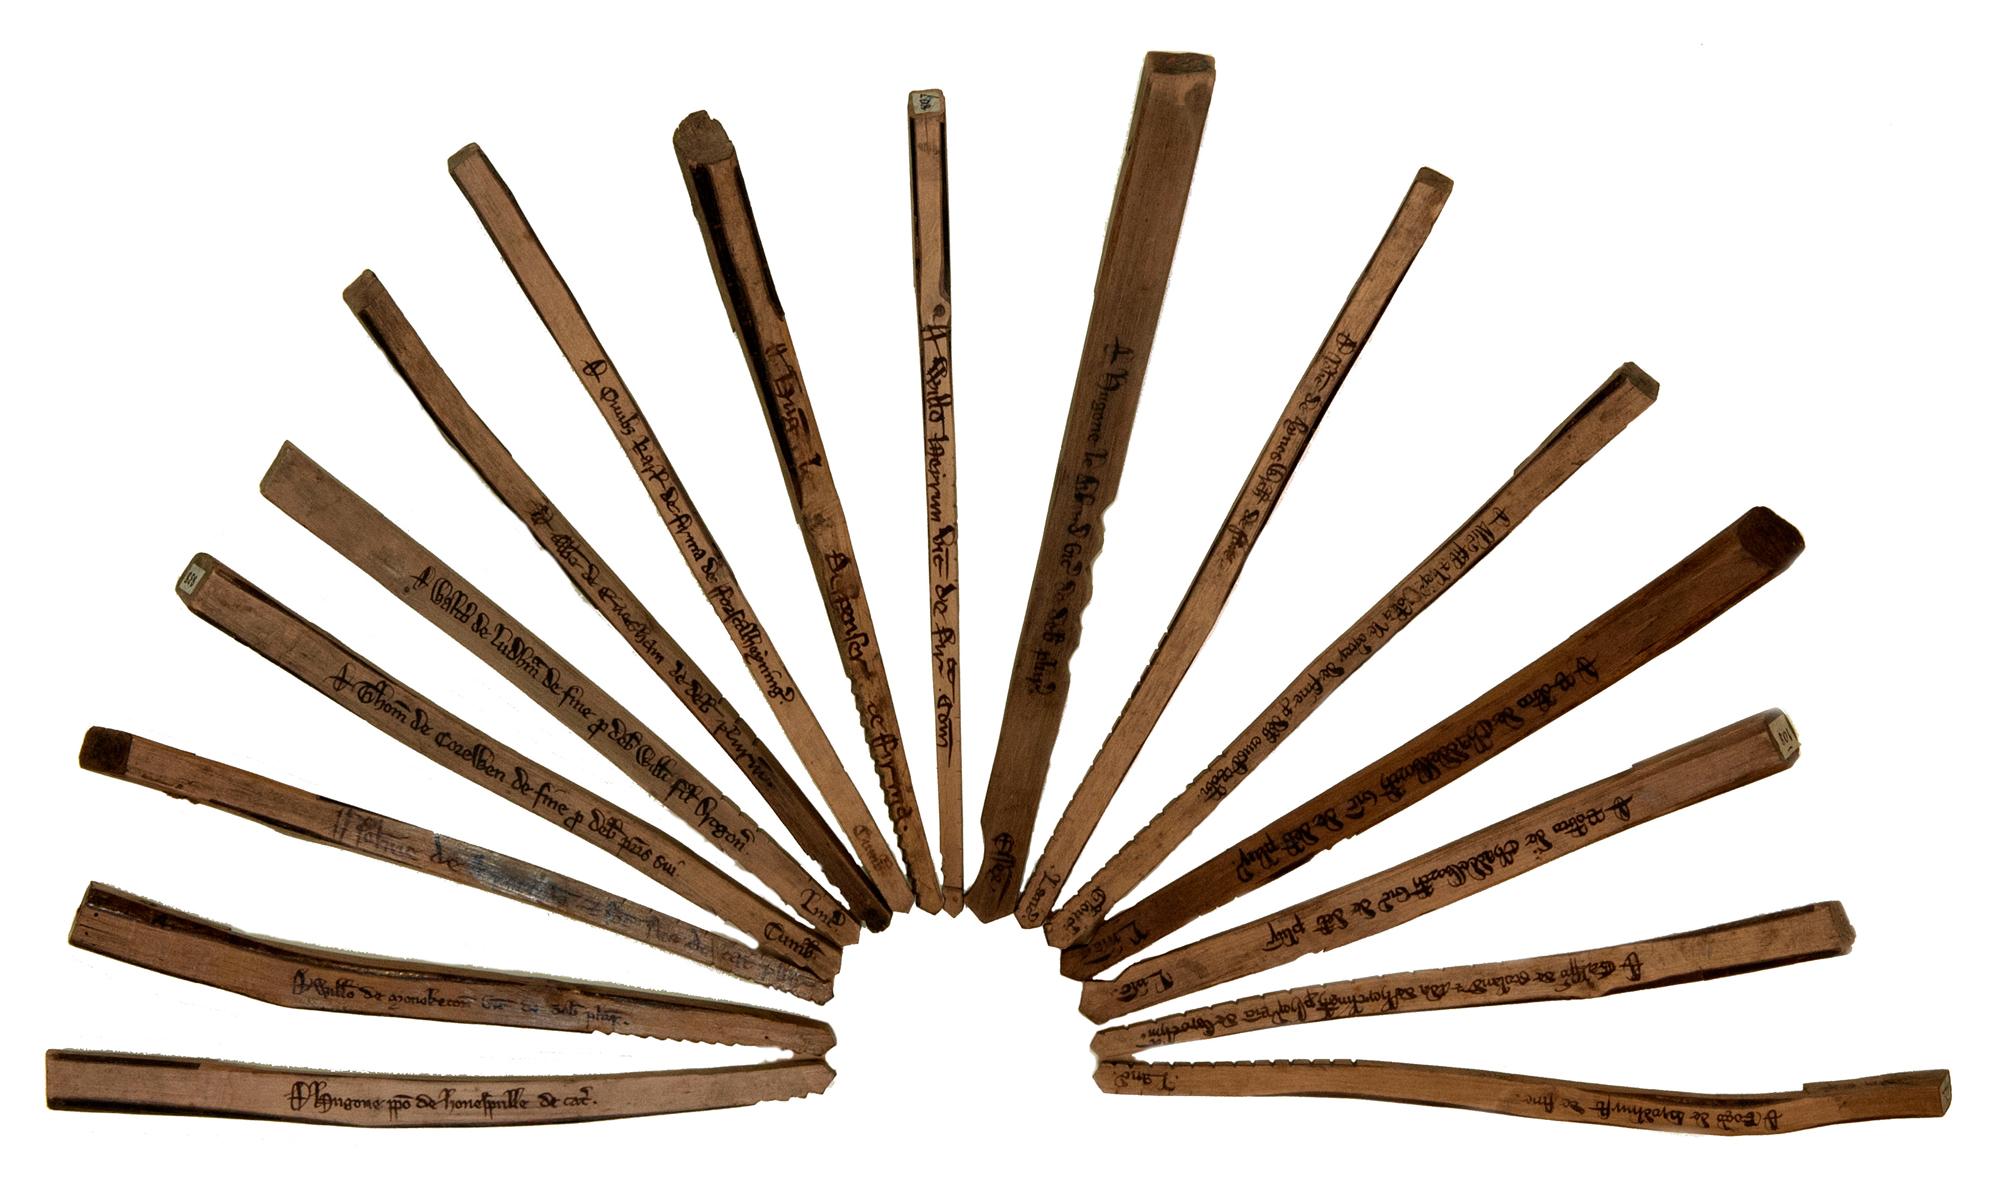 Tally sticks